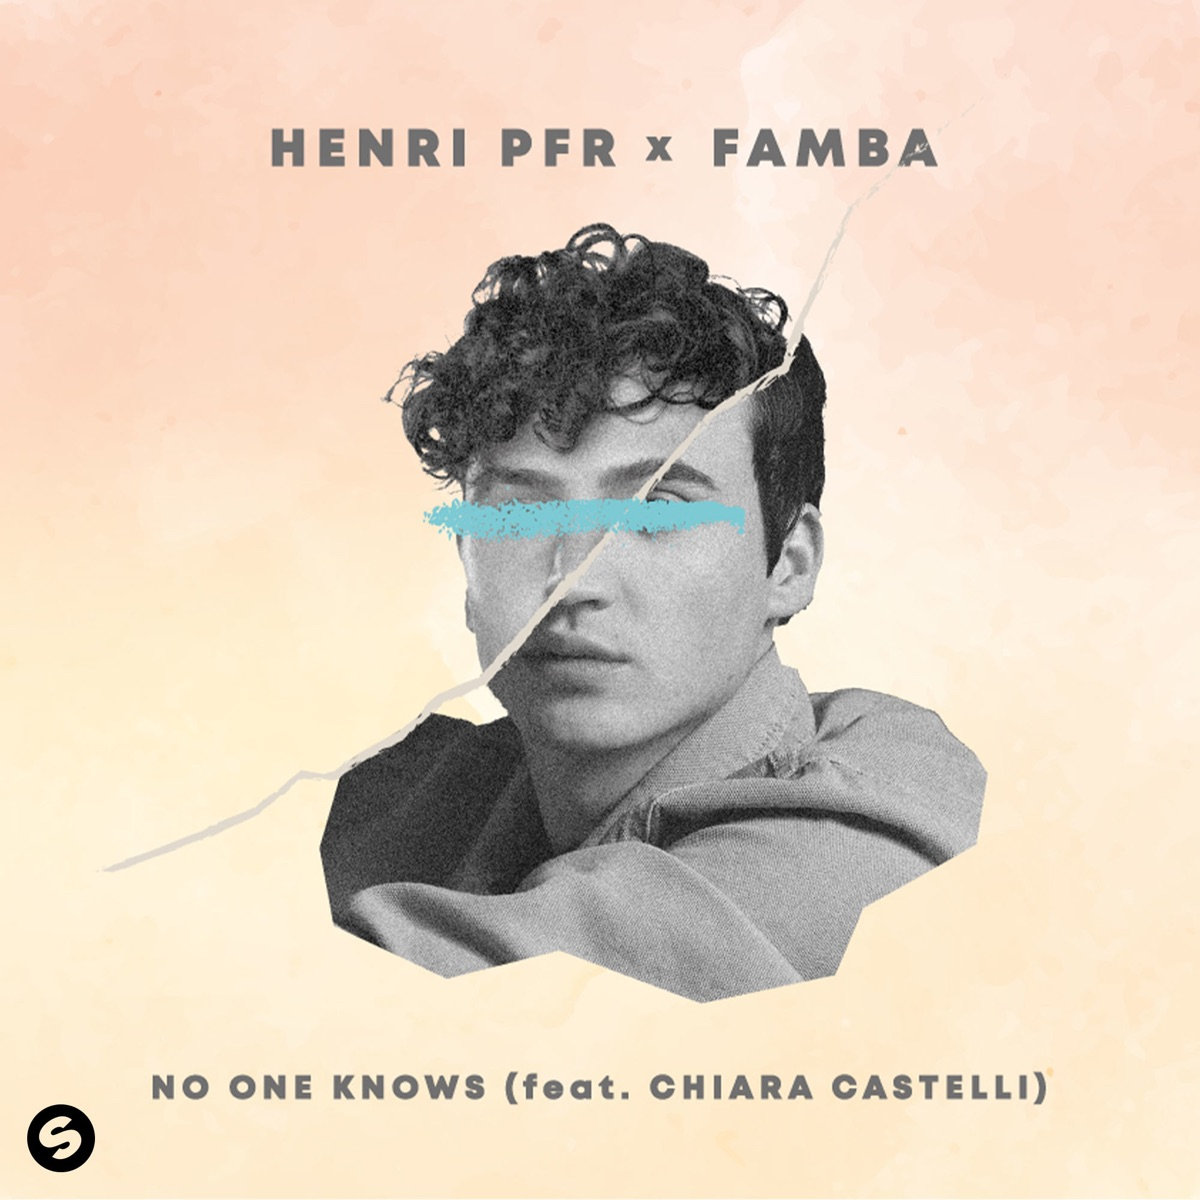 HENRI PFR X FAMBA FT. CHIARA CASTELLI-No One Knows